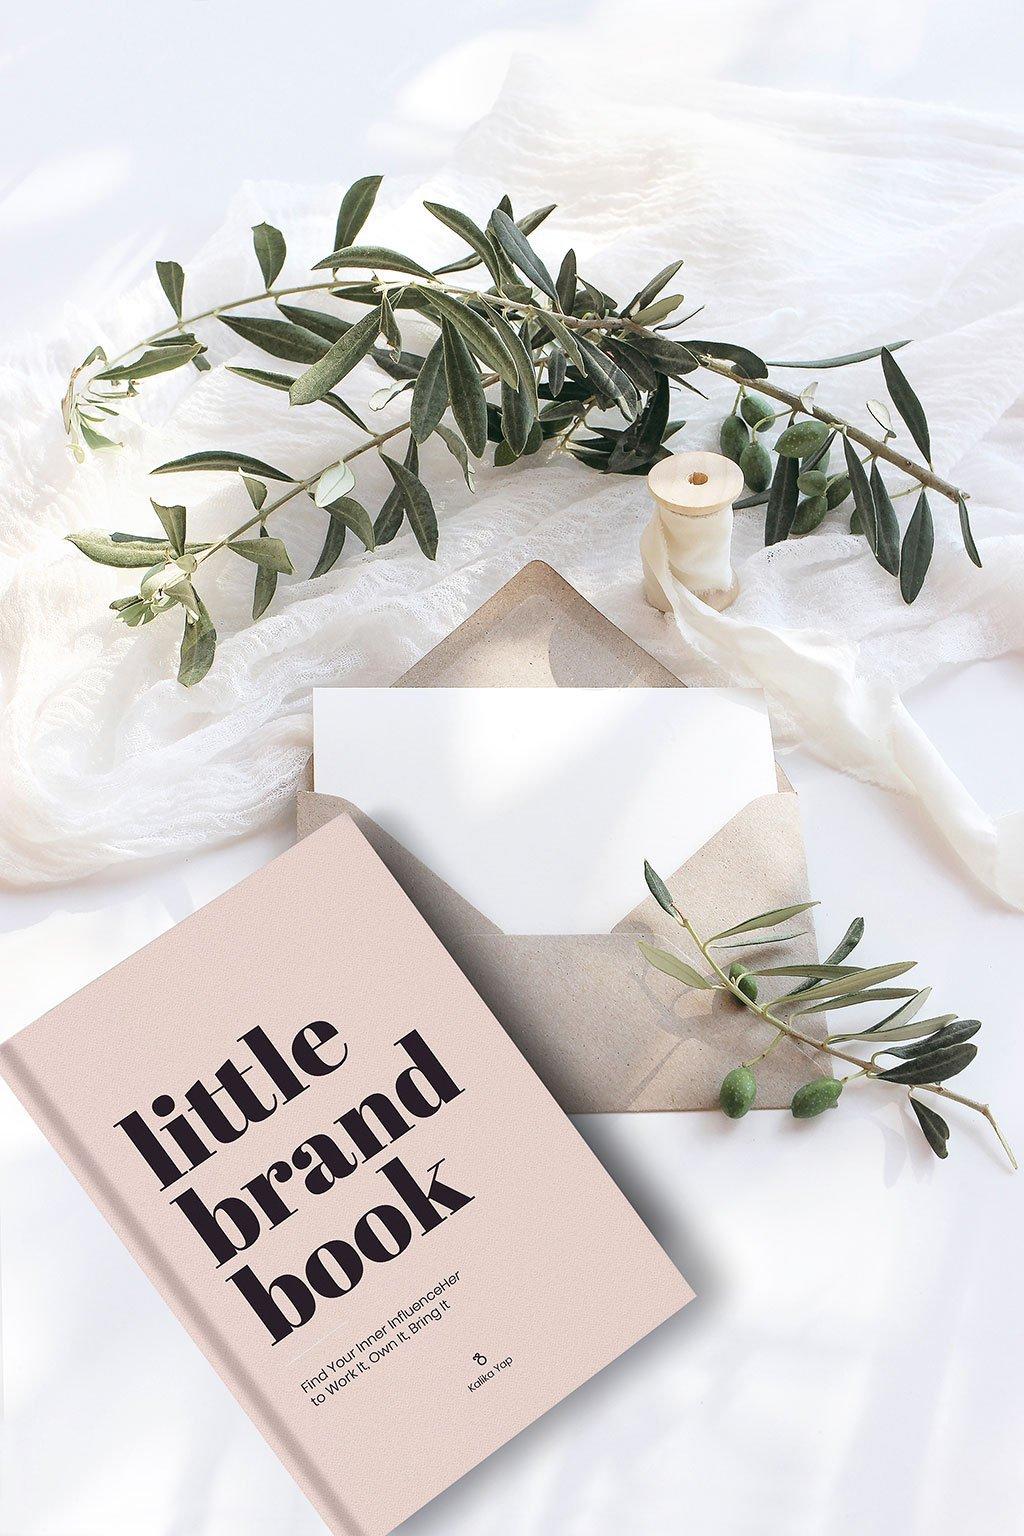 Little brand book has been featured in kalika yap recent blog post